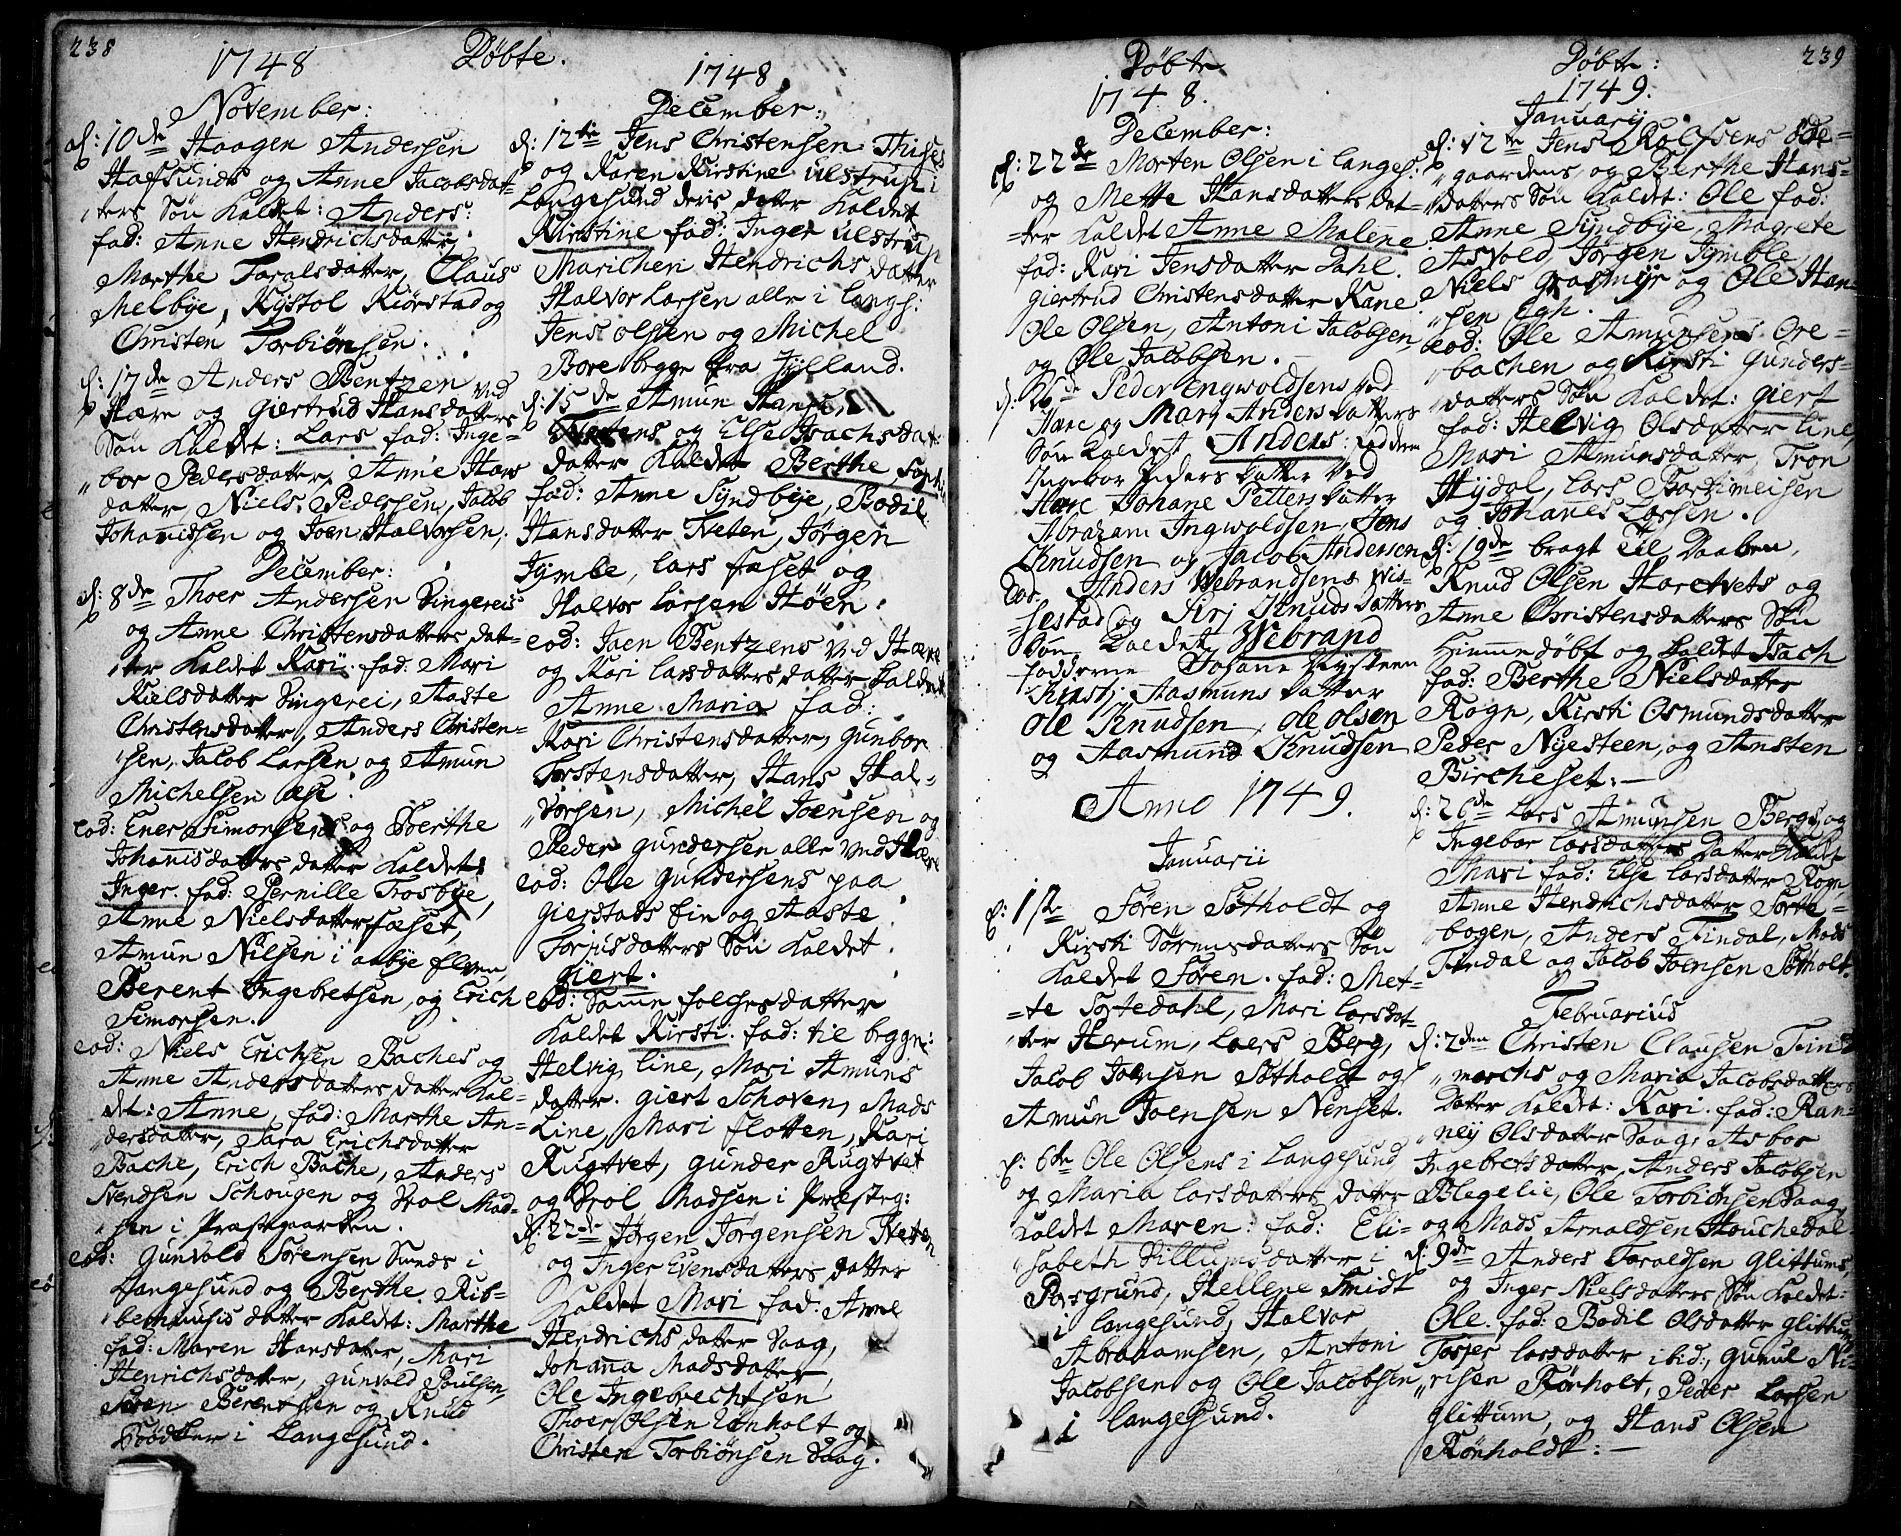 SAKO, Bamble kirkebøker, F/Fa/L0001: Ministerialbok nr. I 1, 1702-1774, s. 238-239